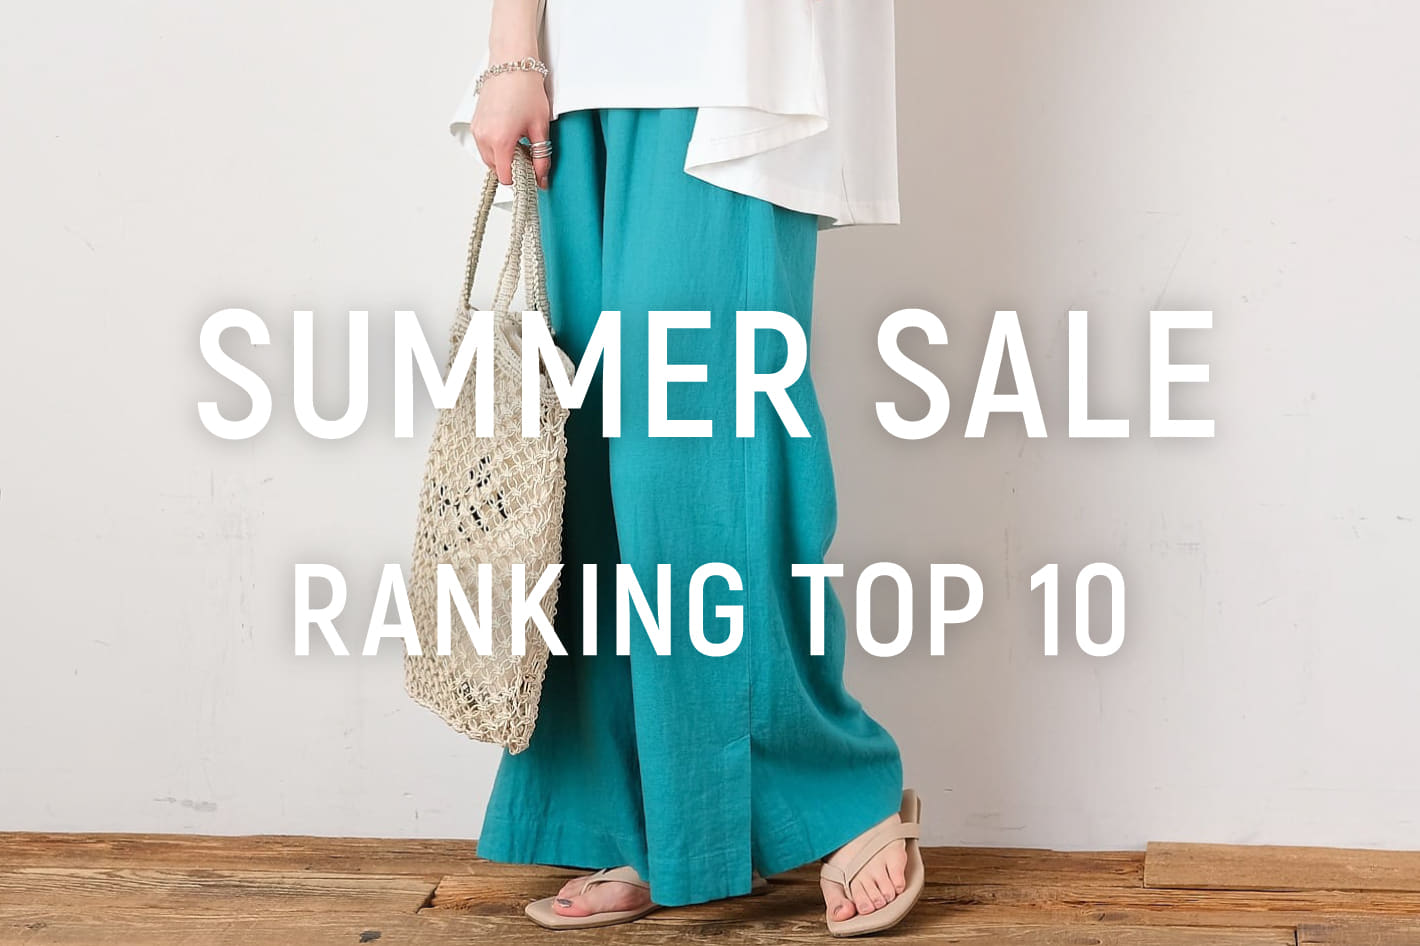 CIAOPANIC TYPY SUMMER SALE【RANKING TOP 10】